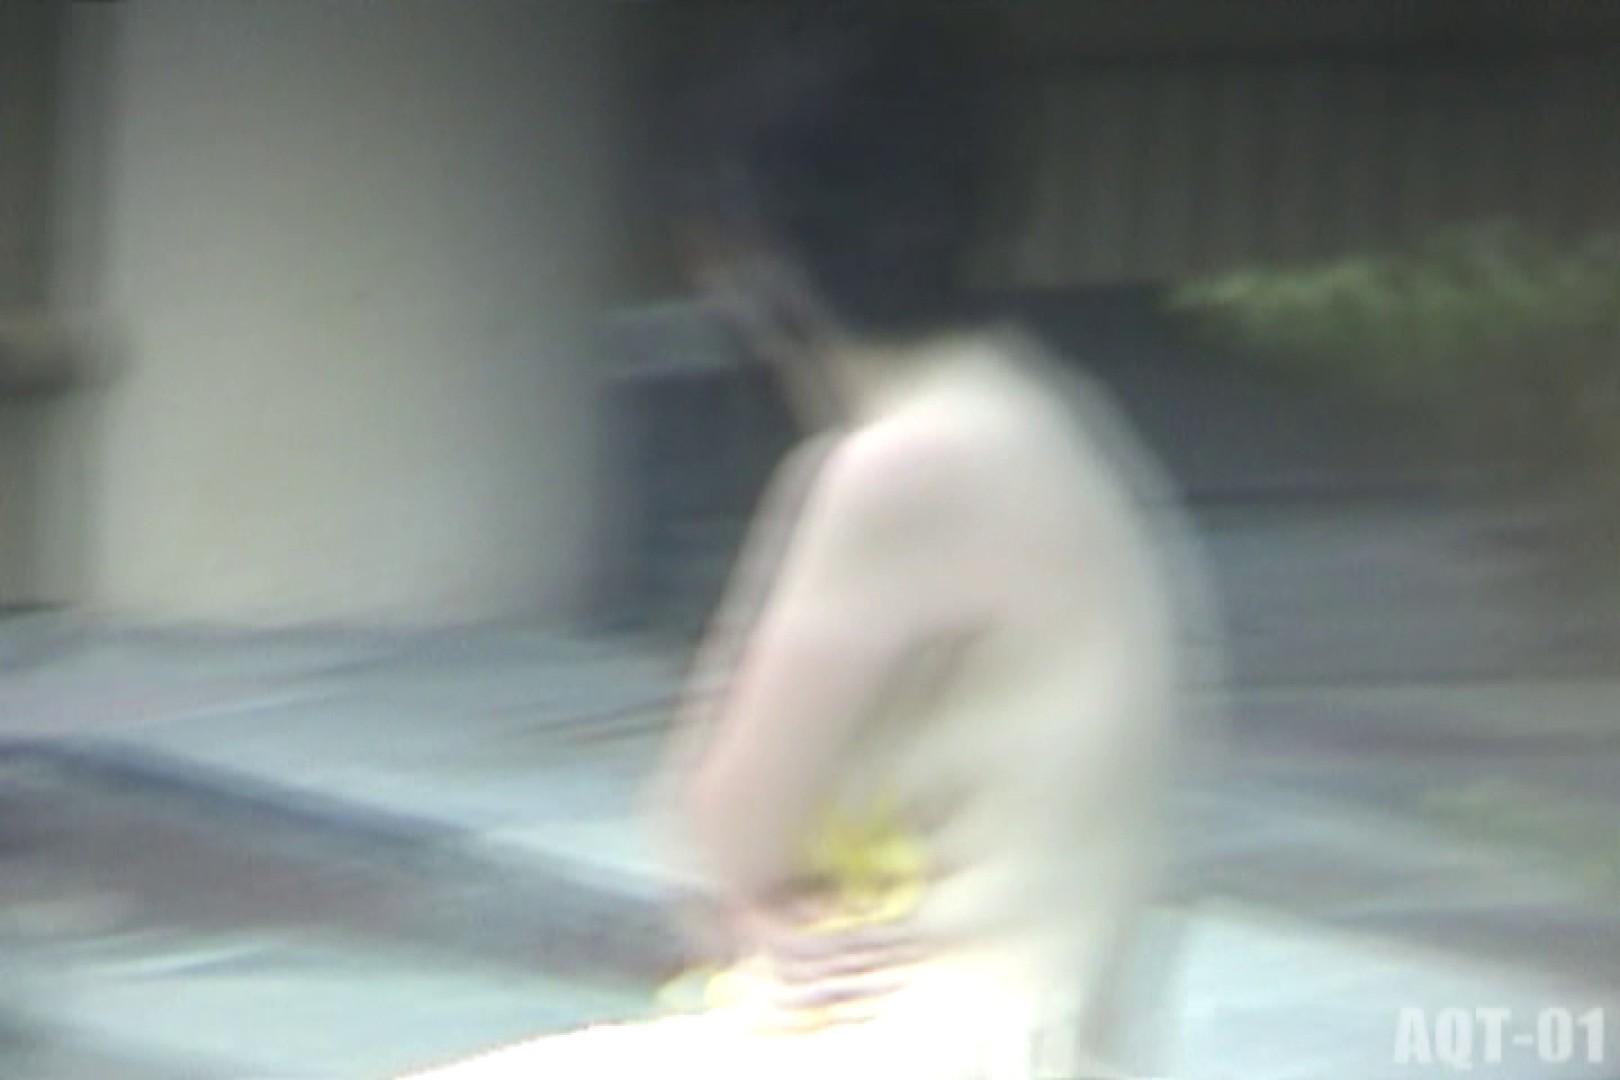 Aquaな露天風呂Vol.717 露天風呂編 | 盗撮シリーズ  111PIX 105